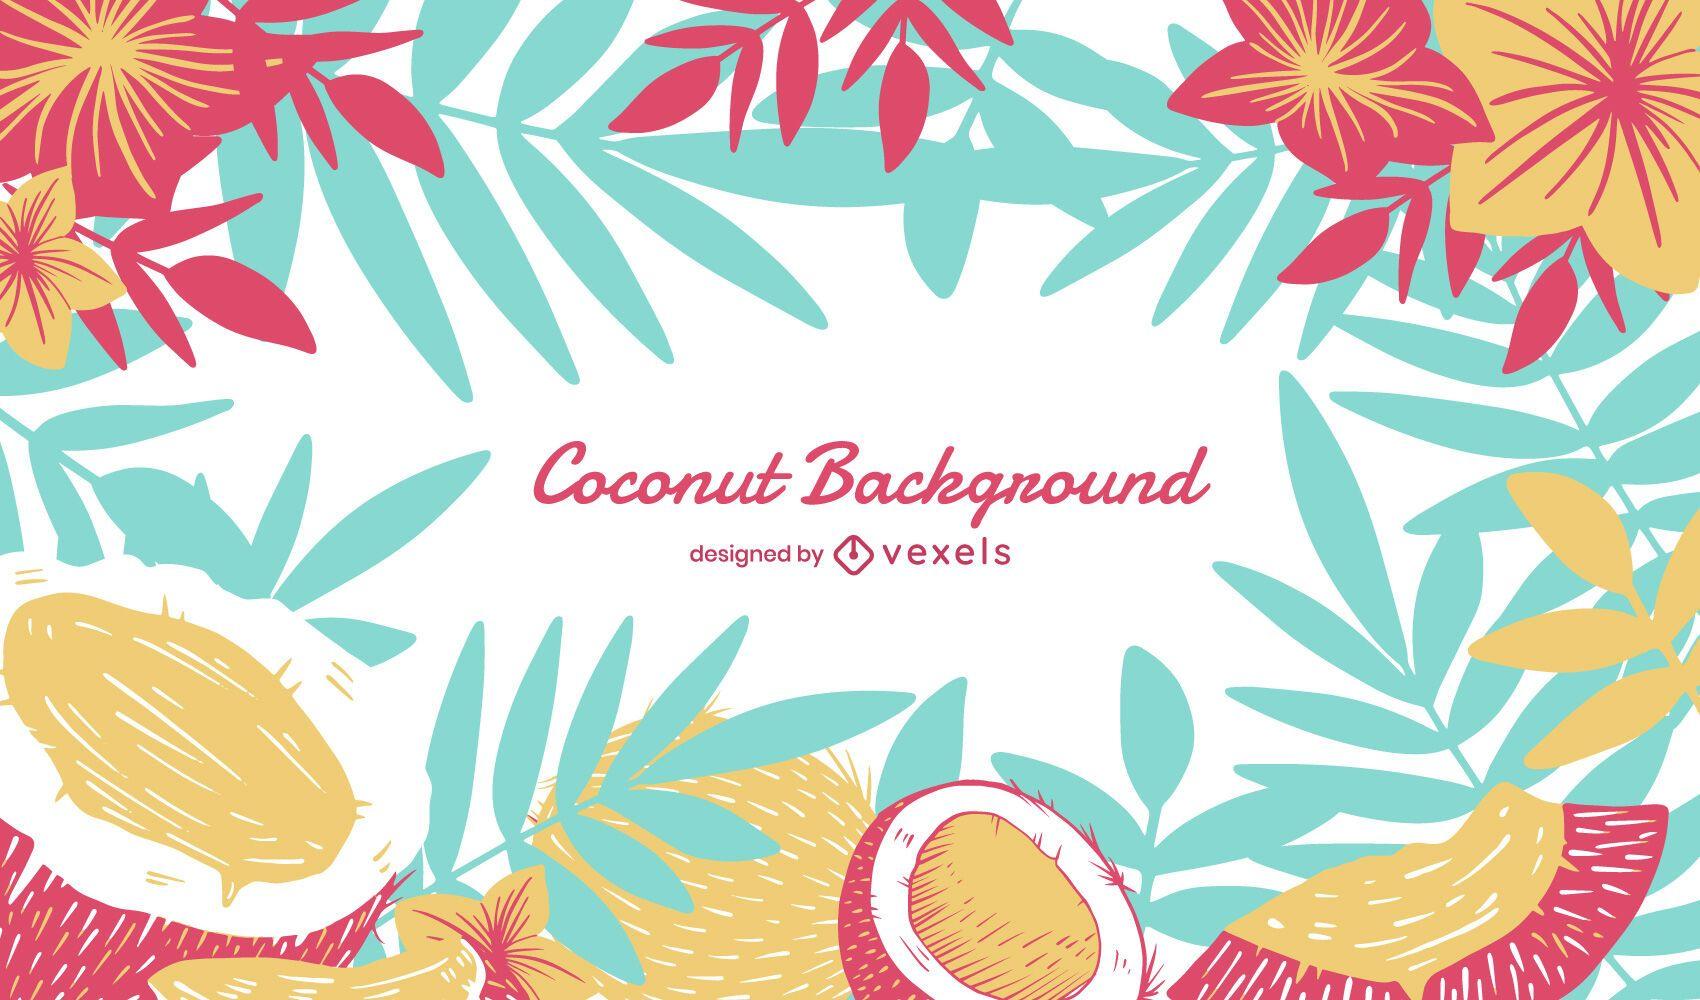 Coconut background design